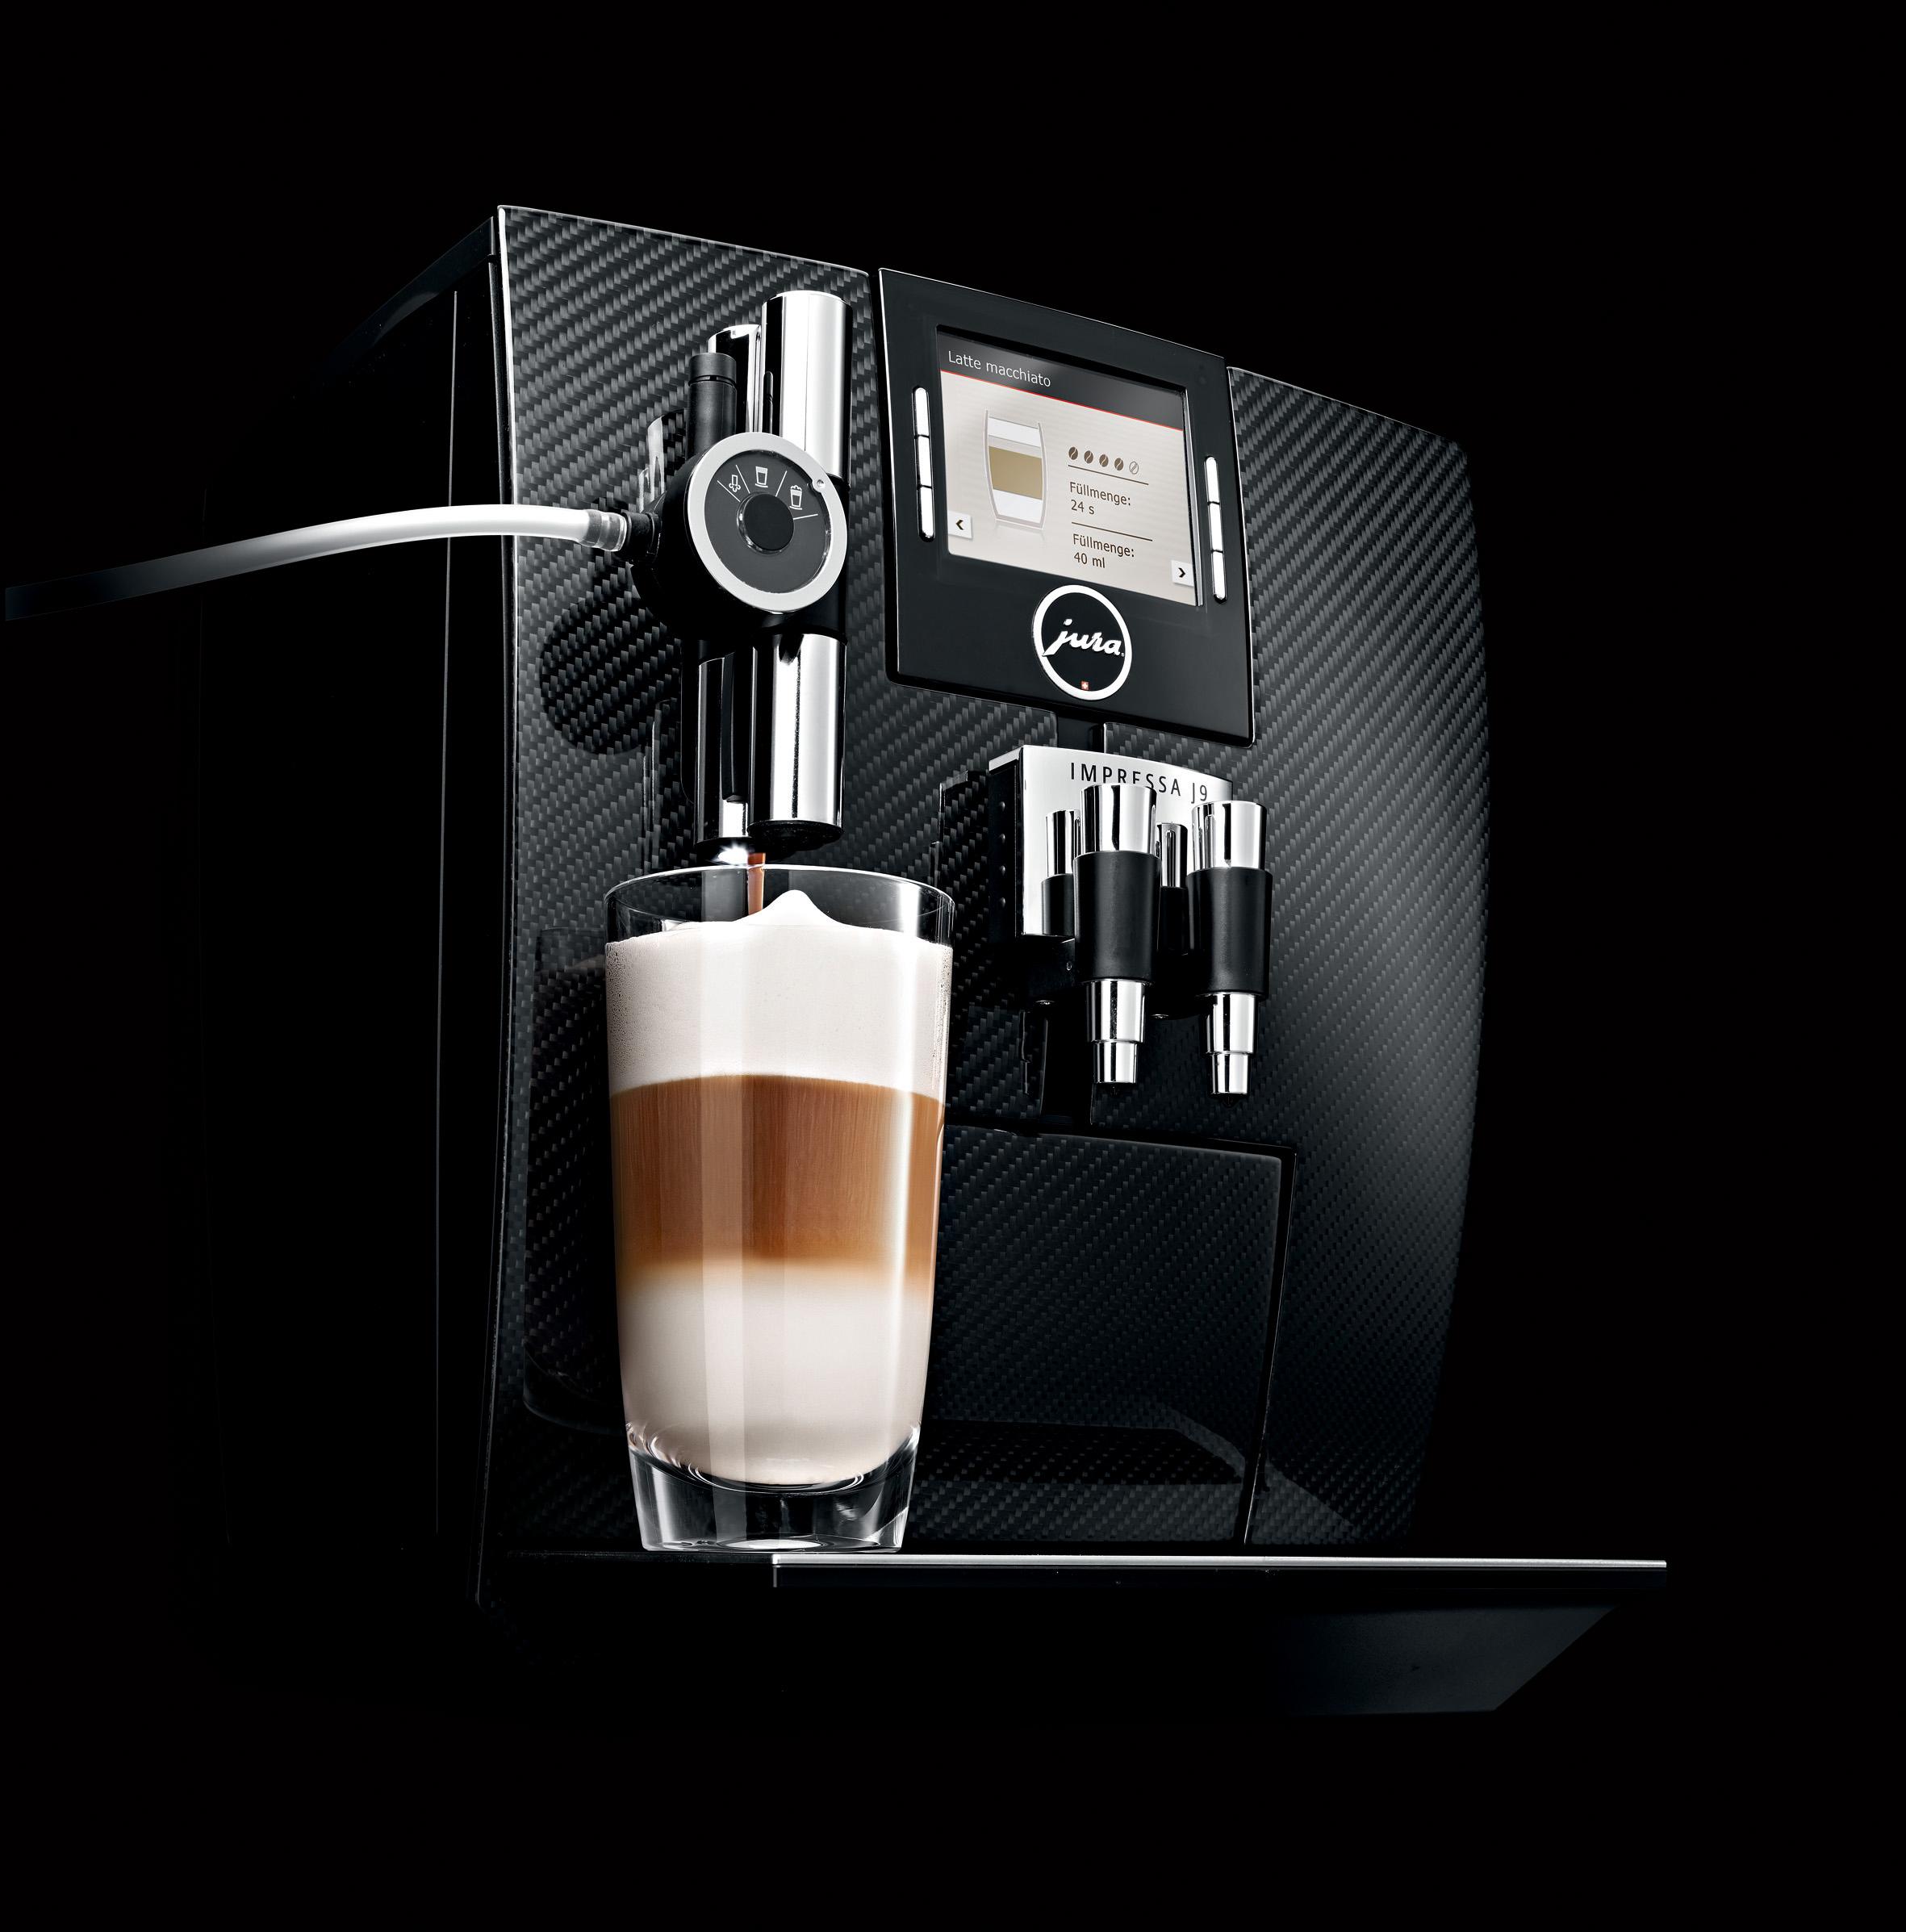 jura impressa j9 3 carbon 2 jura impressa j9 3 one touch tft kaffeevollautomat mit front aus. Black Bedroom Furniture Sets. Home Design Ideas